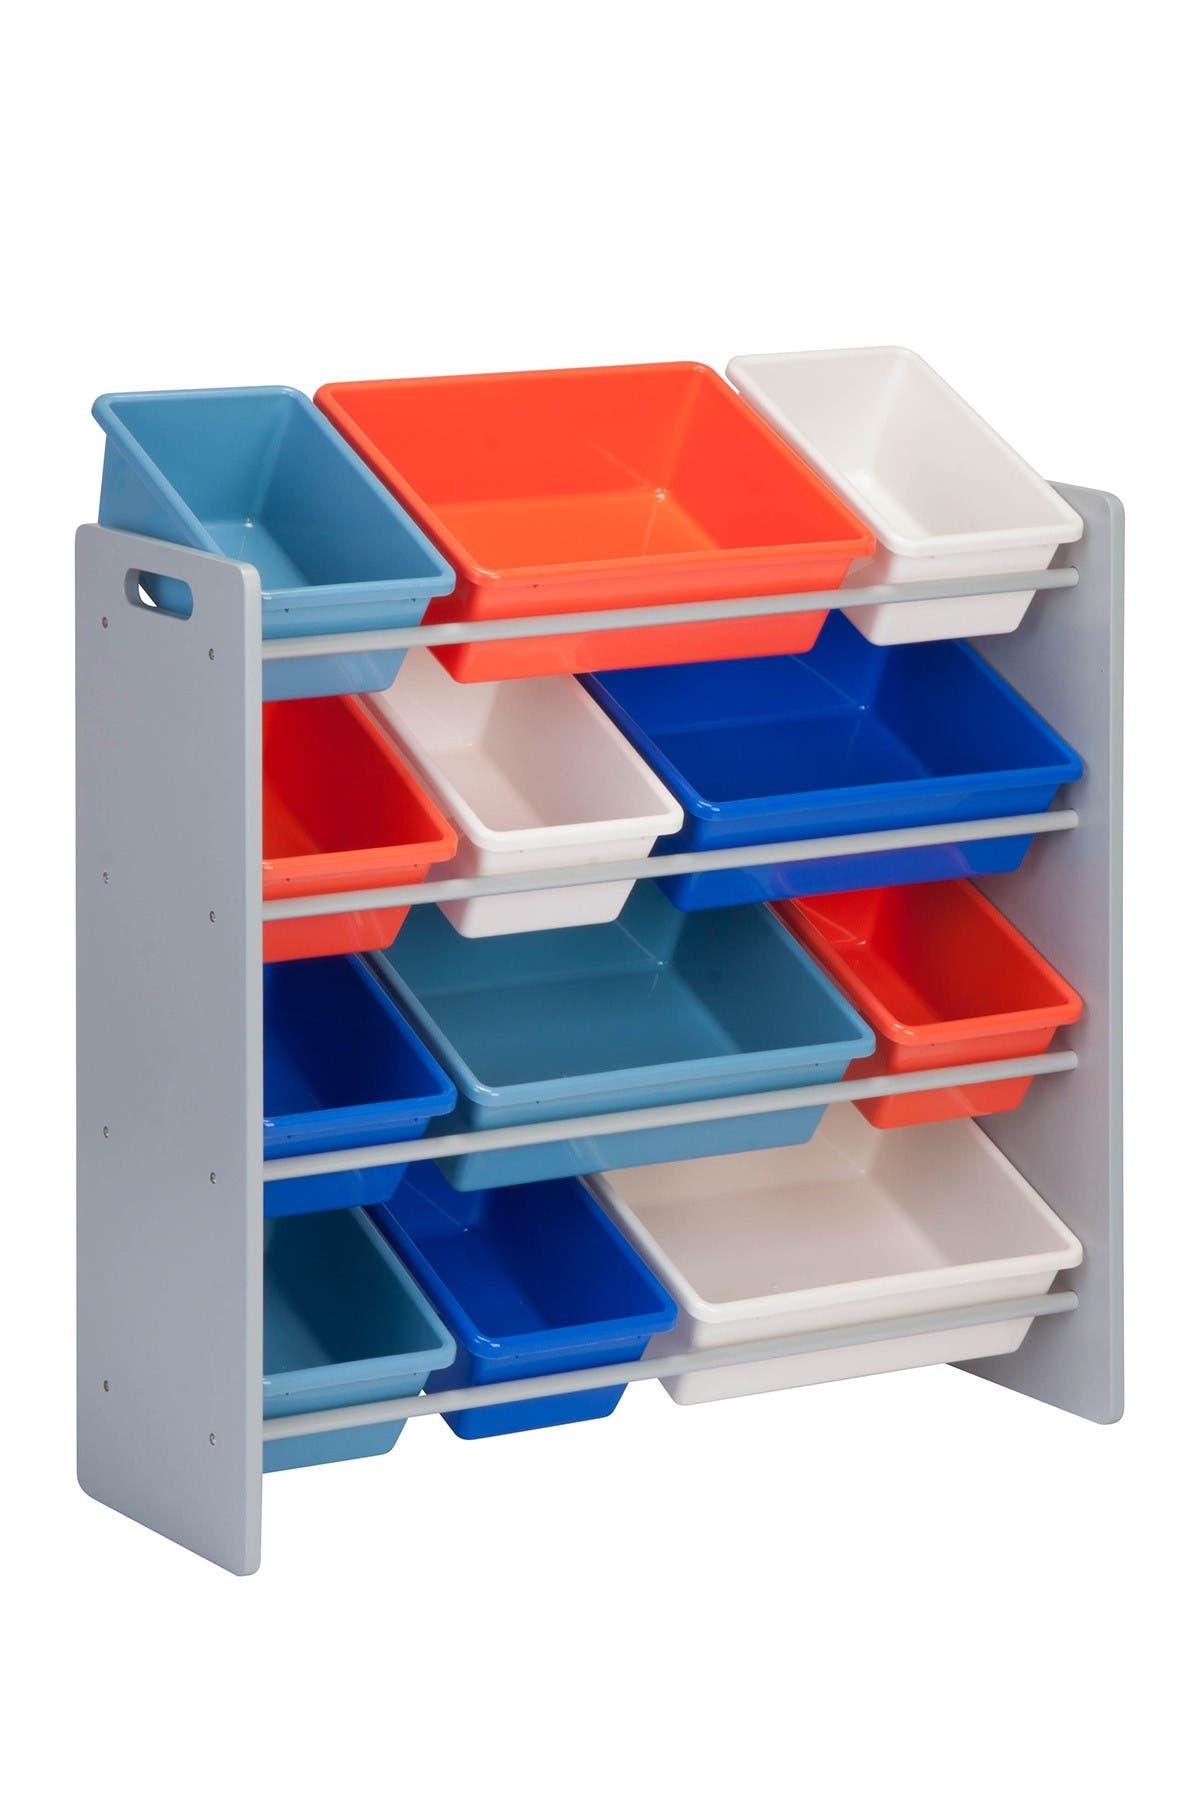 Image of Honey-Can-Do Kids Toy Organizer & Storage Bins